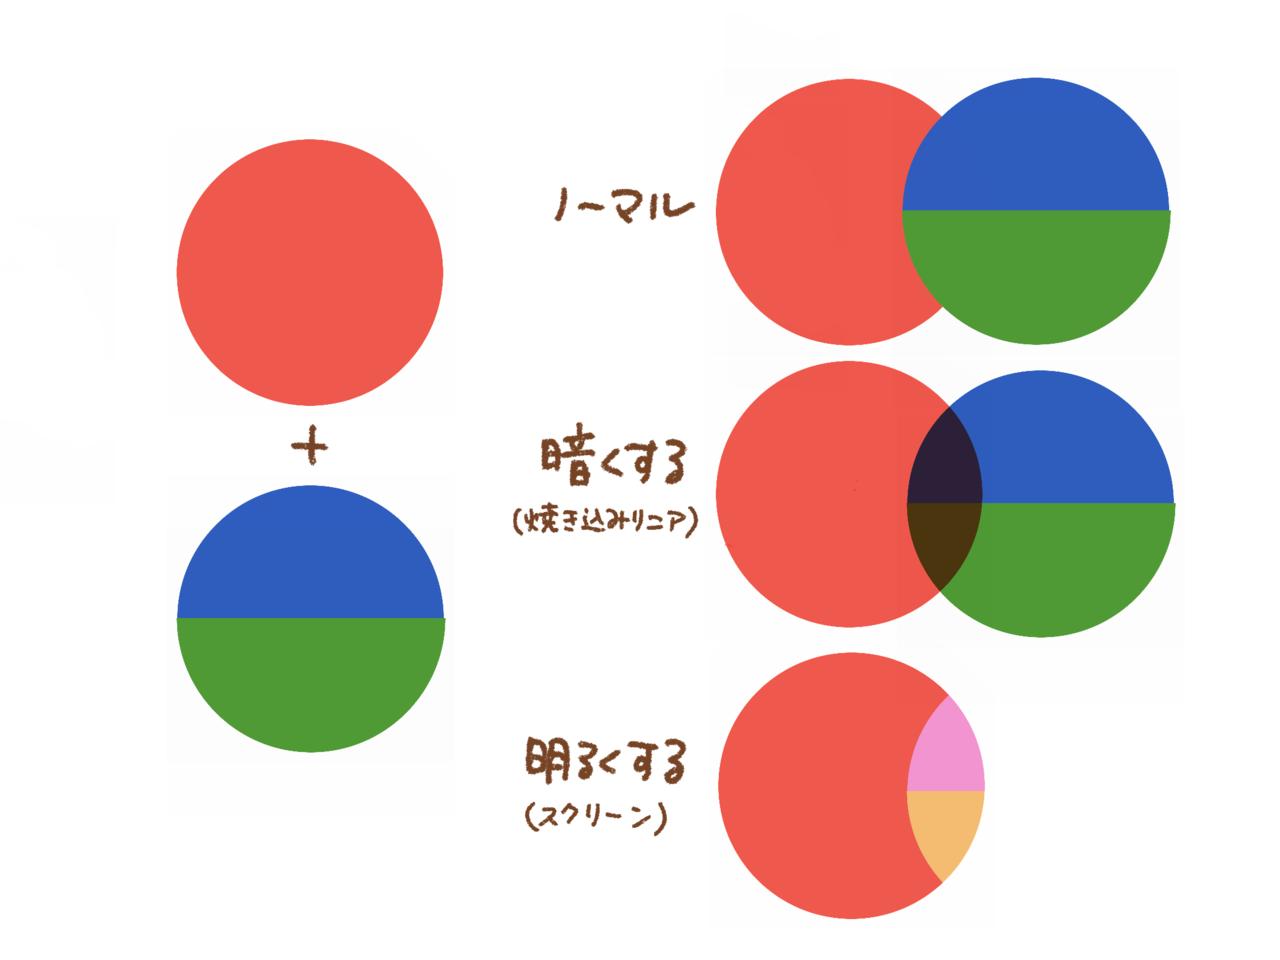 f:id:Imamura:20200420125402p:plain